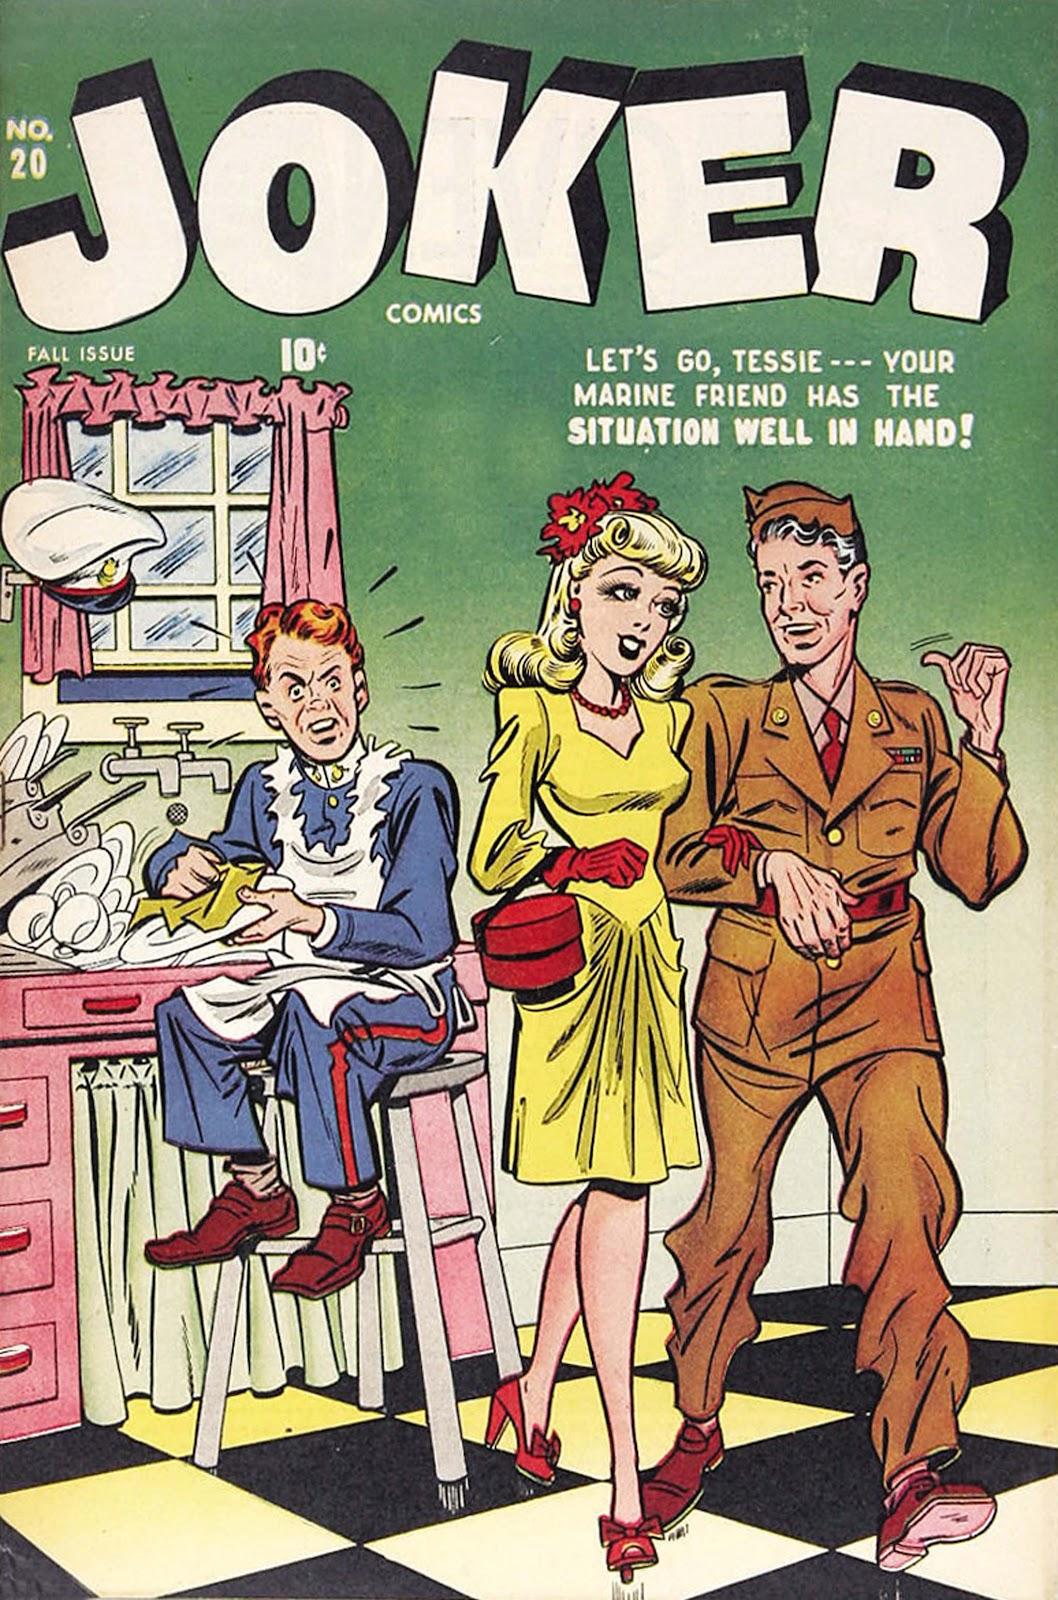 Read online Joker Comics comic -  Issue #20 - 1